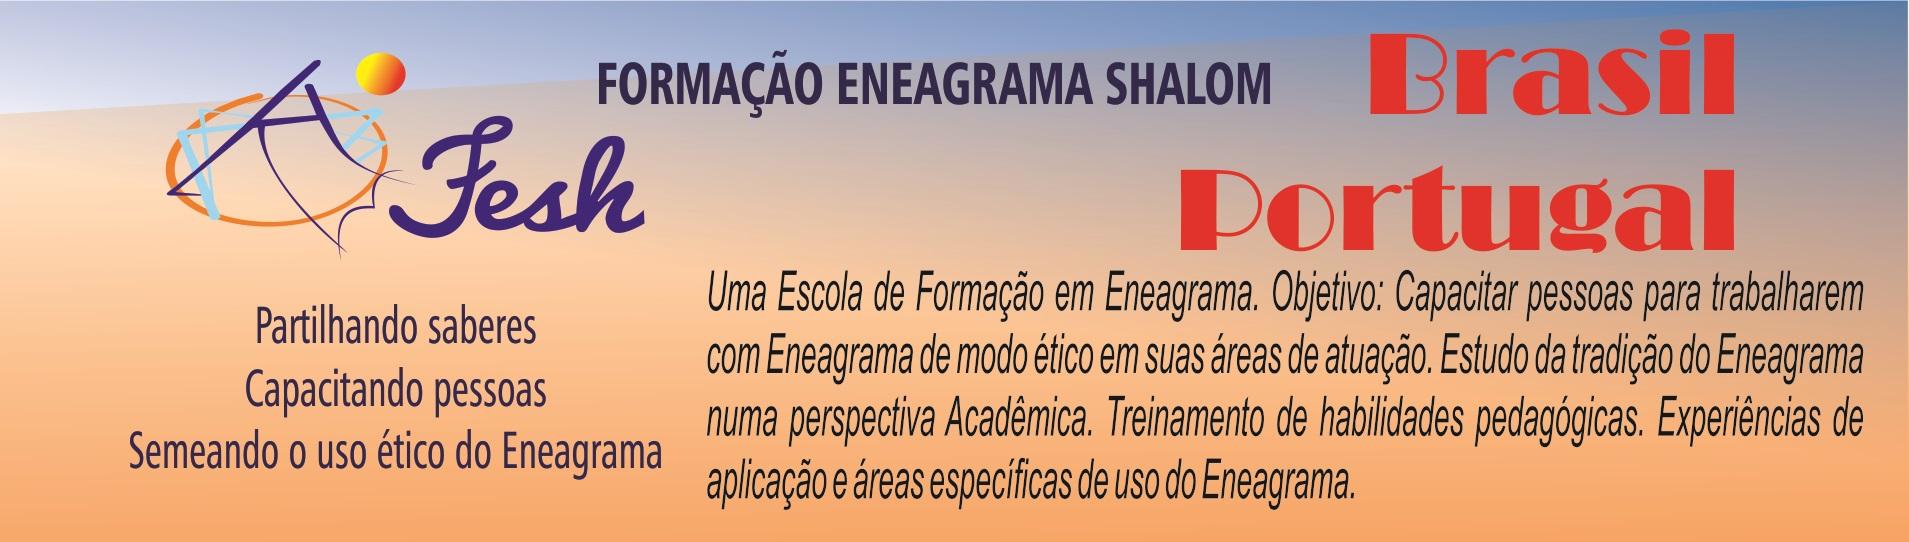 FORMAÇAO ENEAGRAMA SHALOM